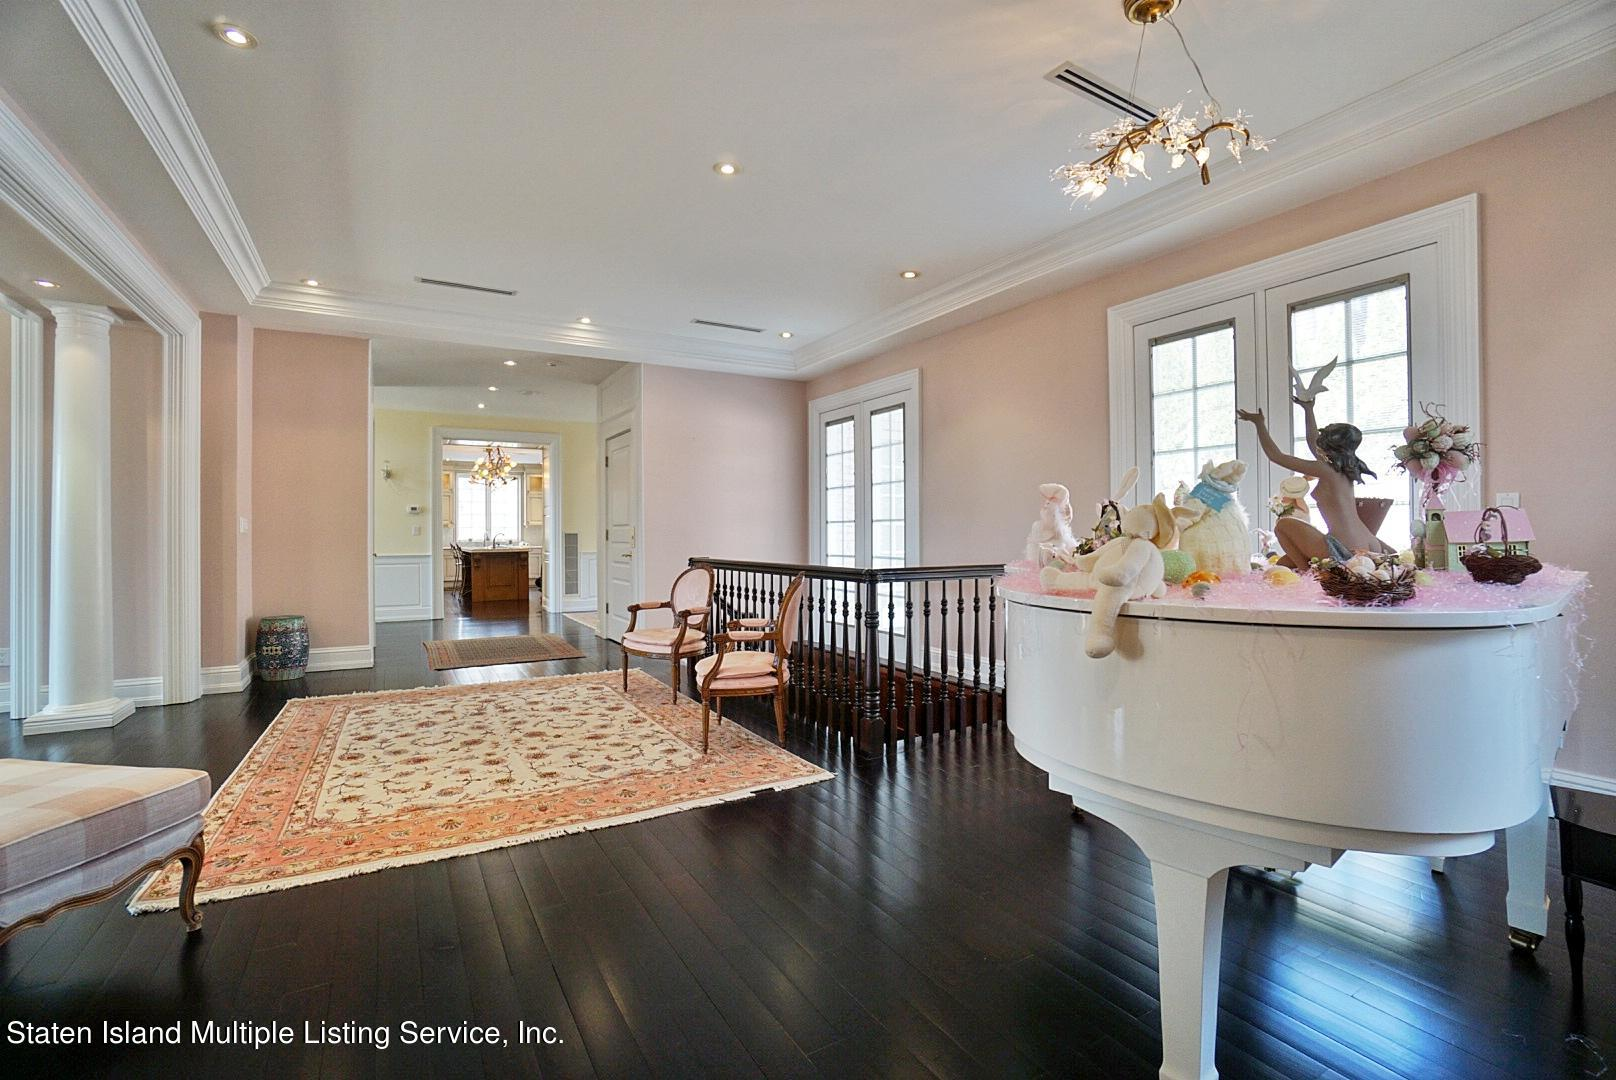 Single Family - Detached 129 Coverly Avenue   Staten Island, NY 10301, MLS-1144490-16